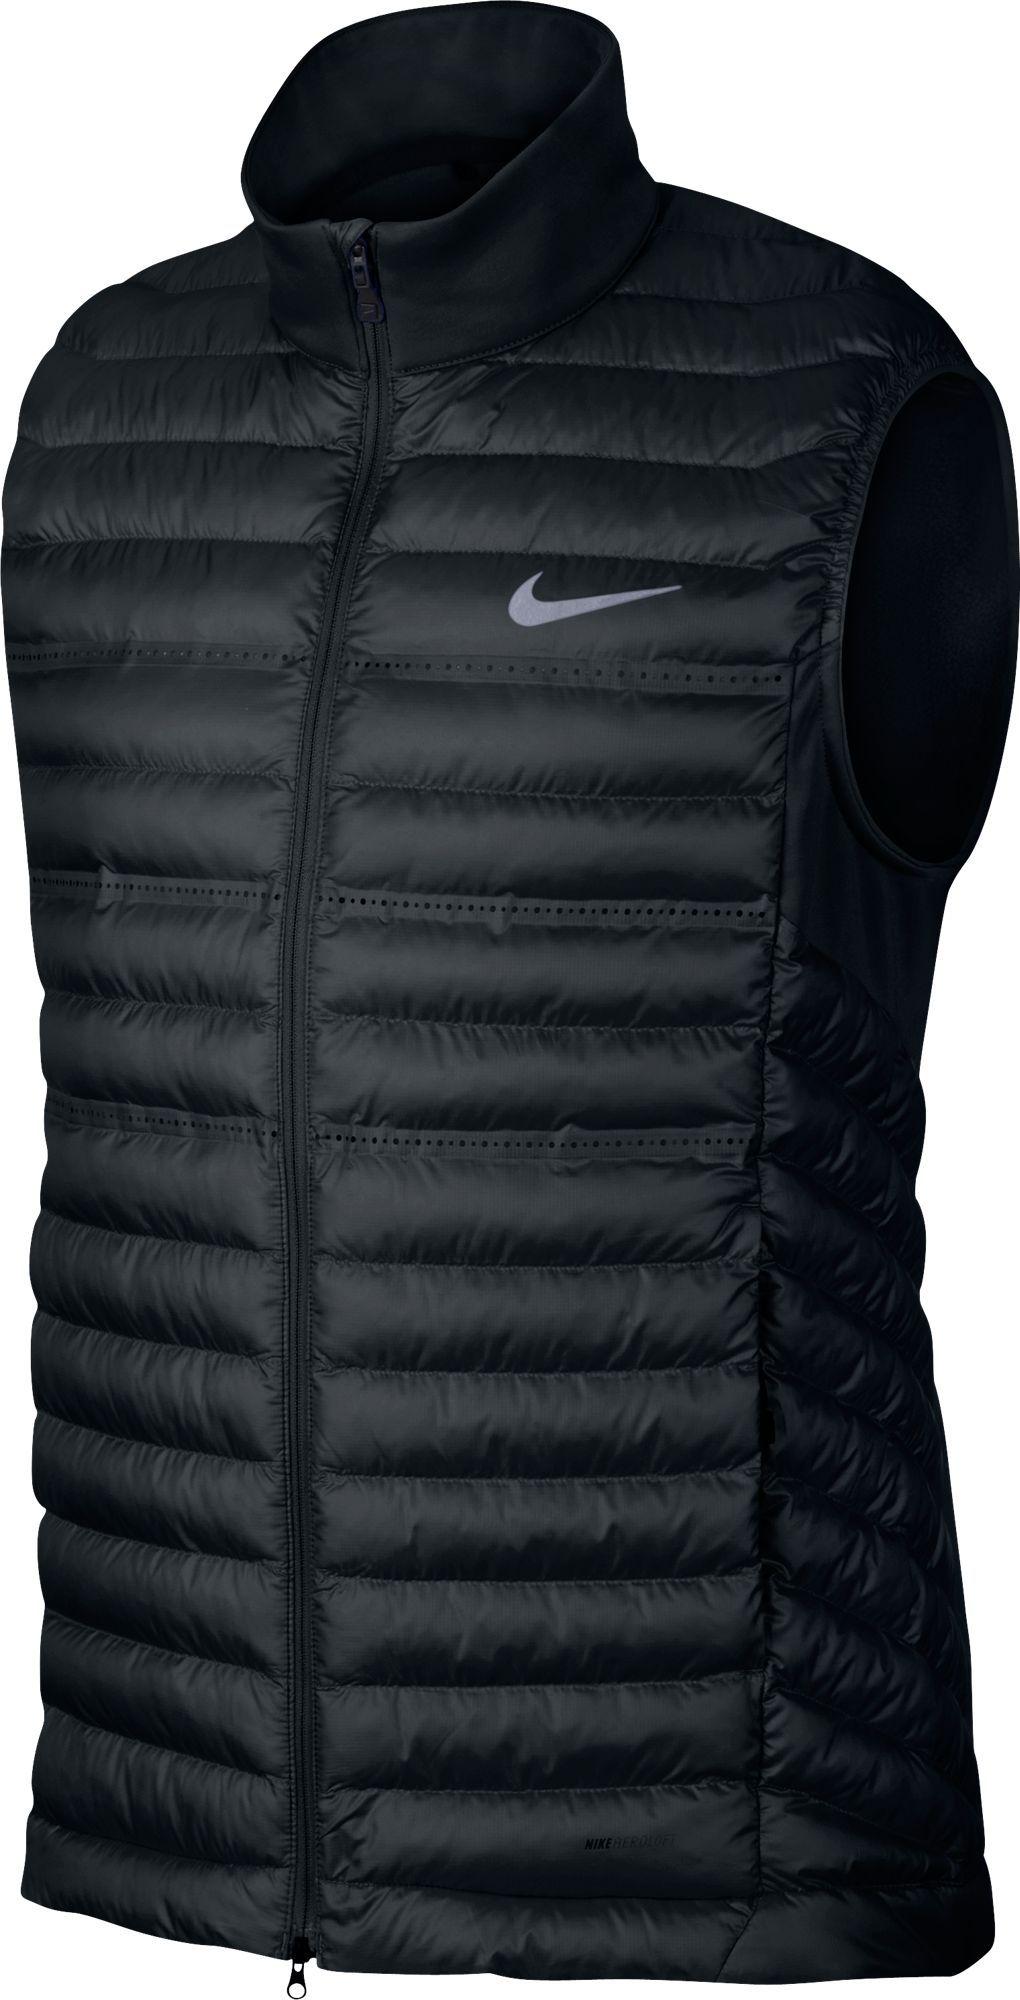 mens polyester golf vest